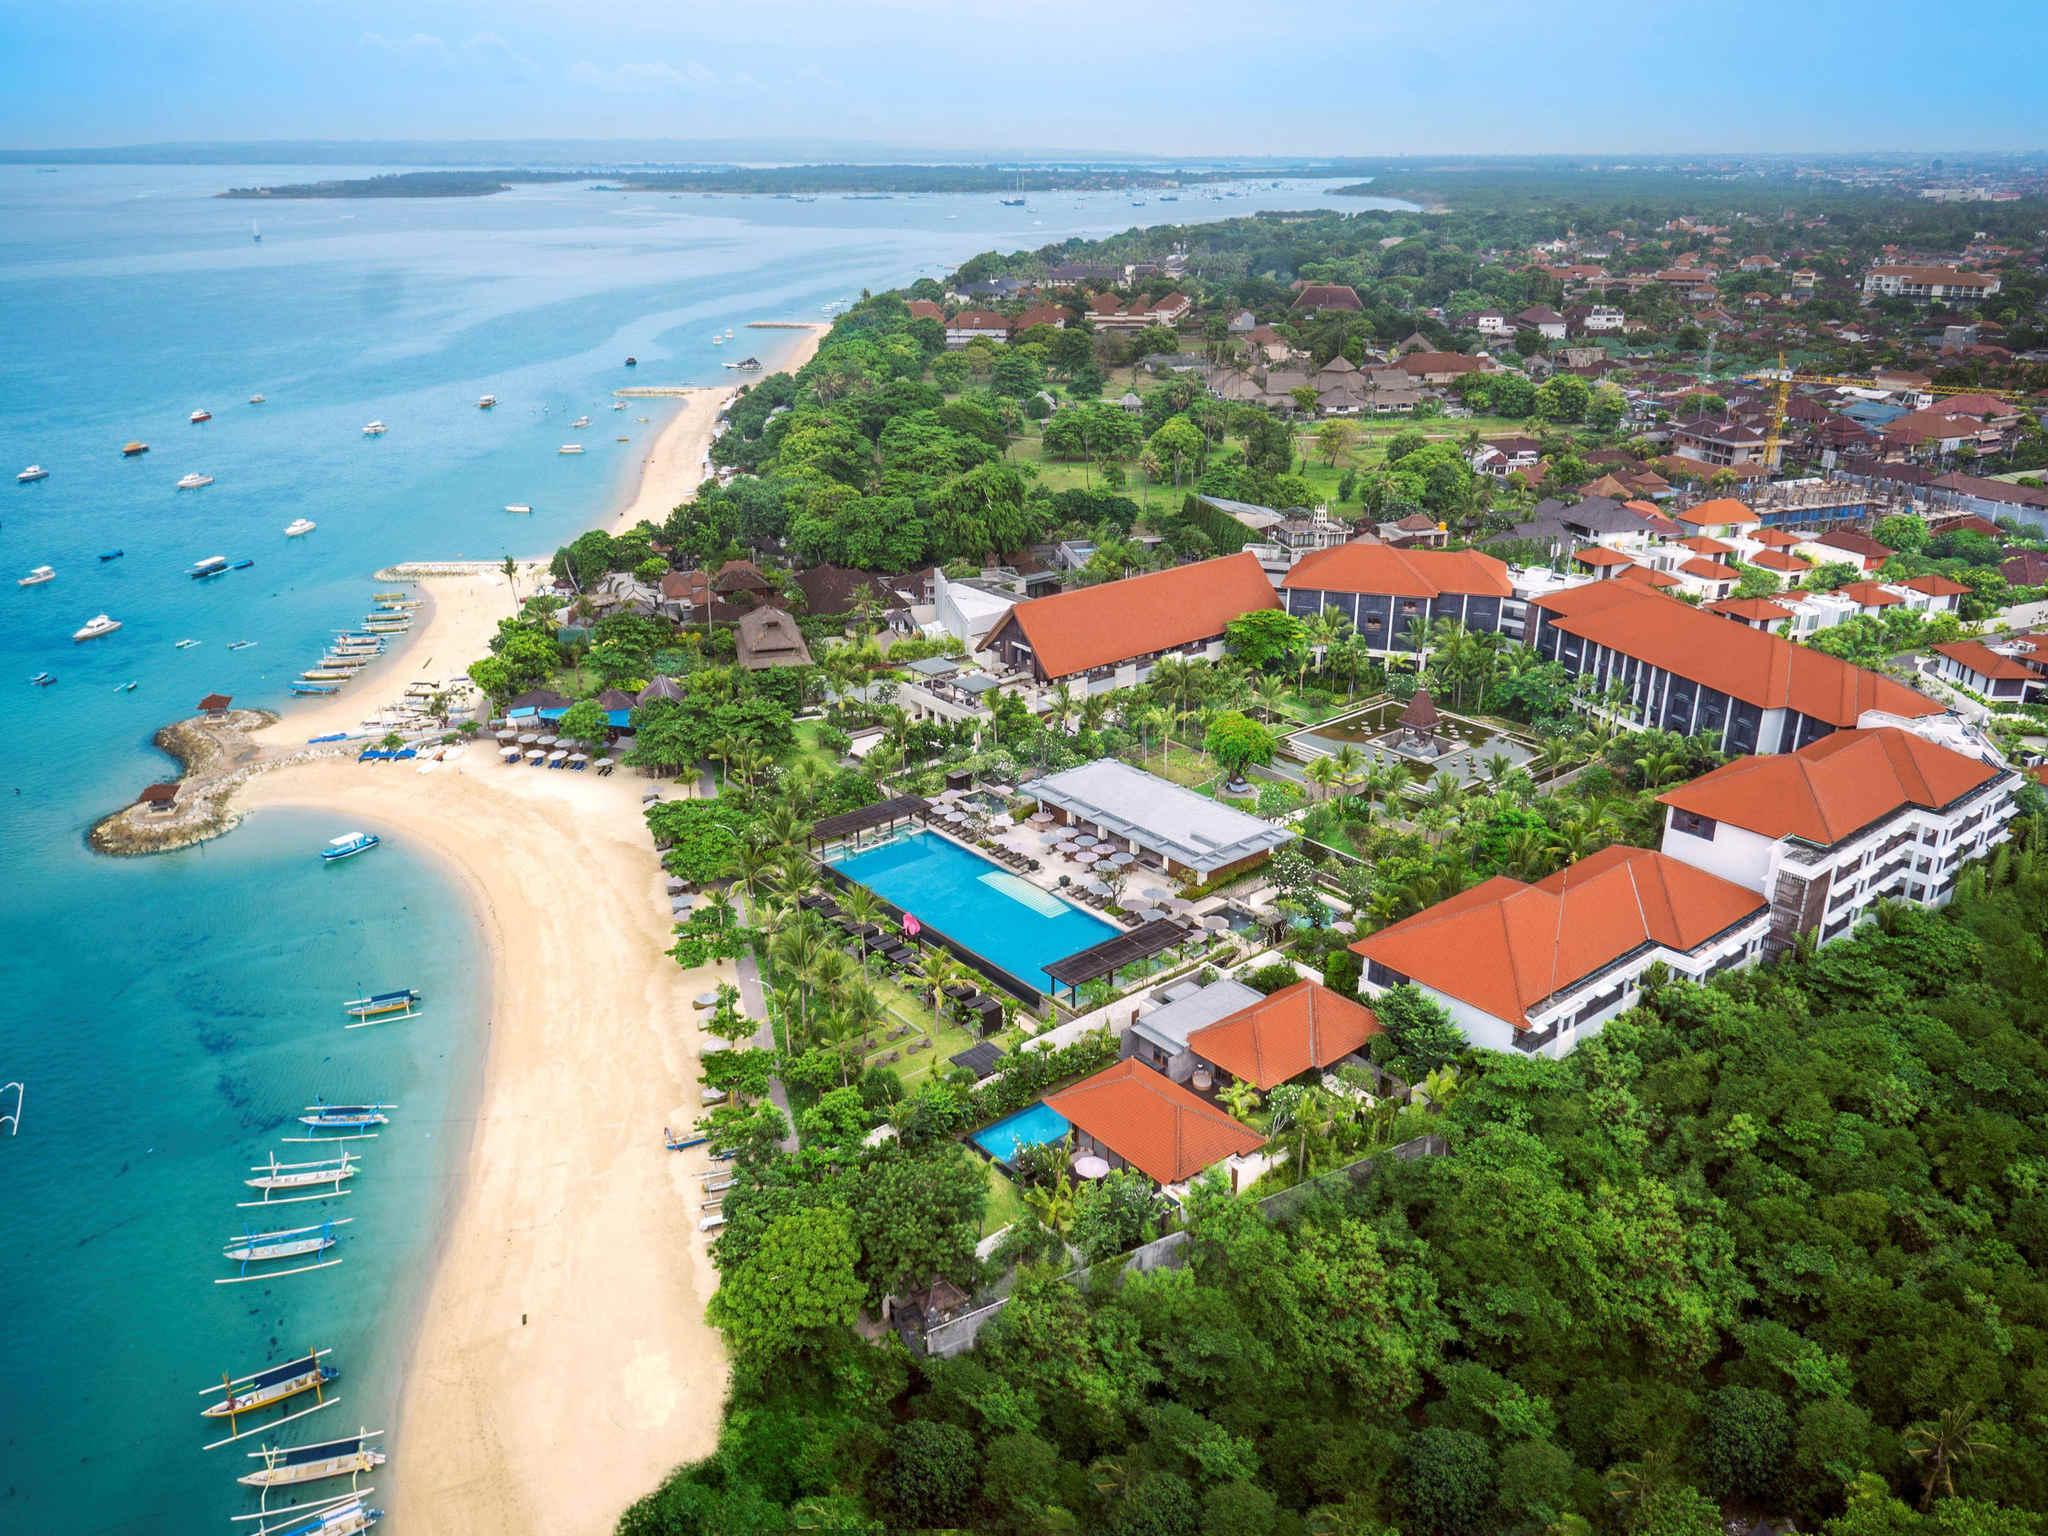 شاطئ سانور اندونيسيا